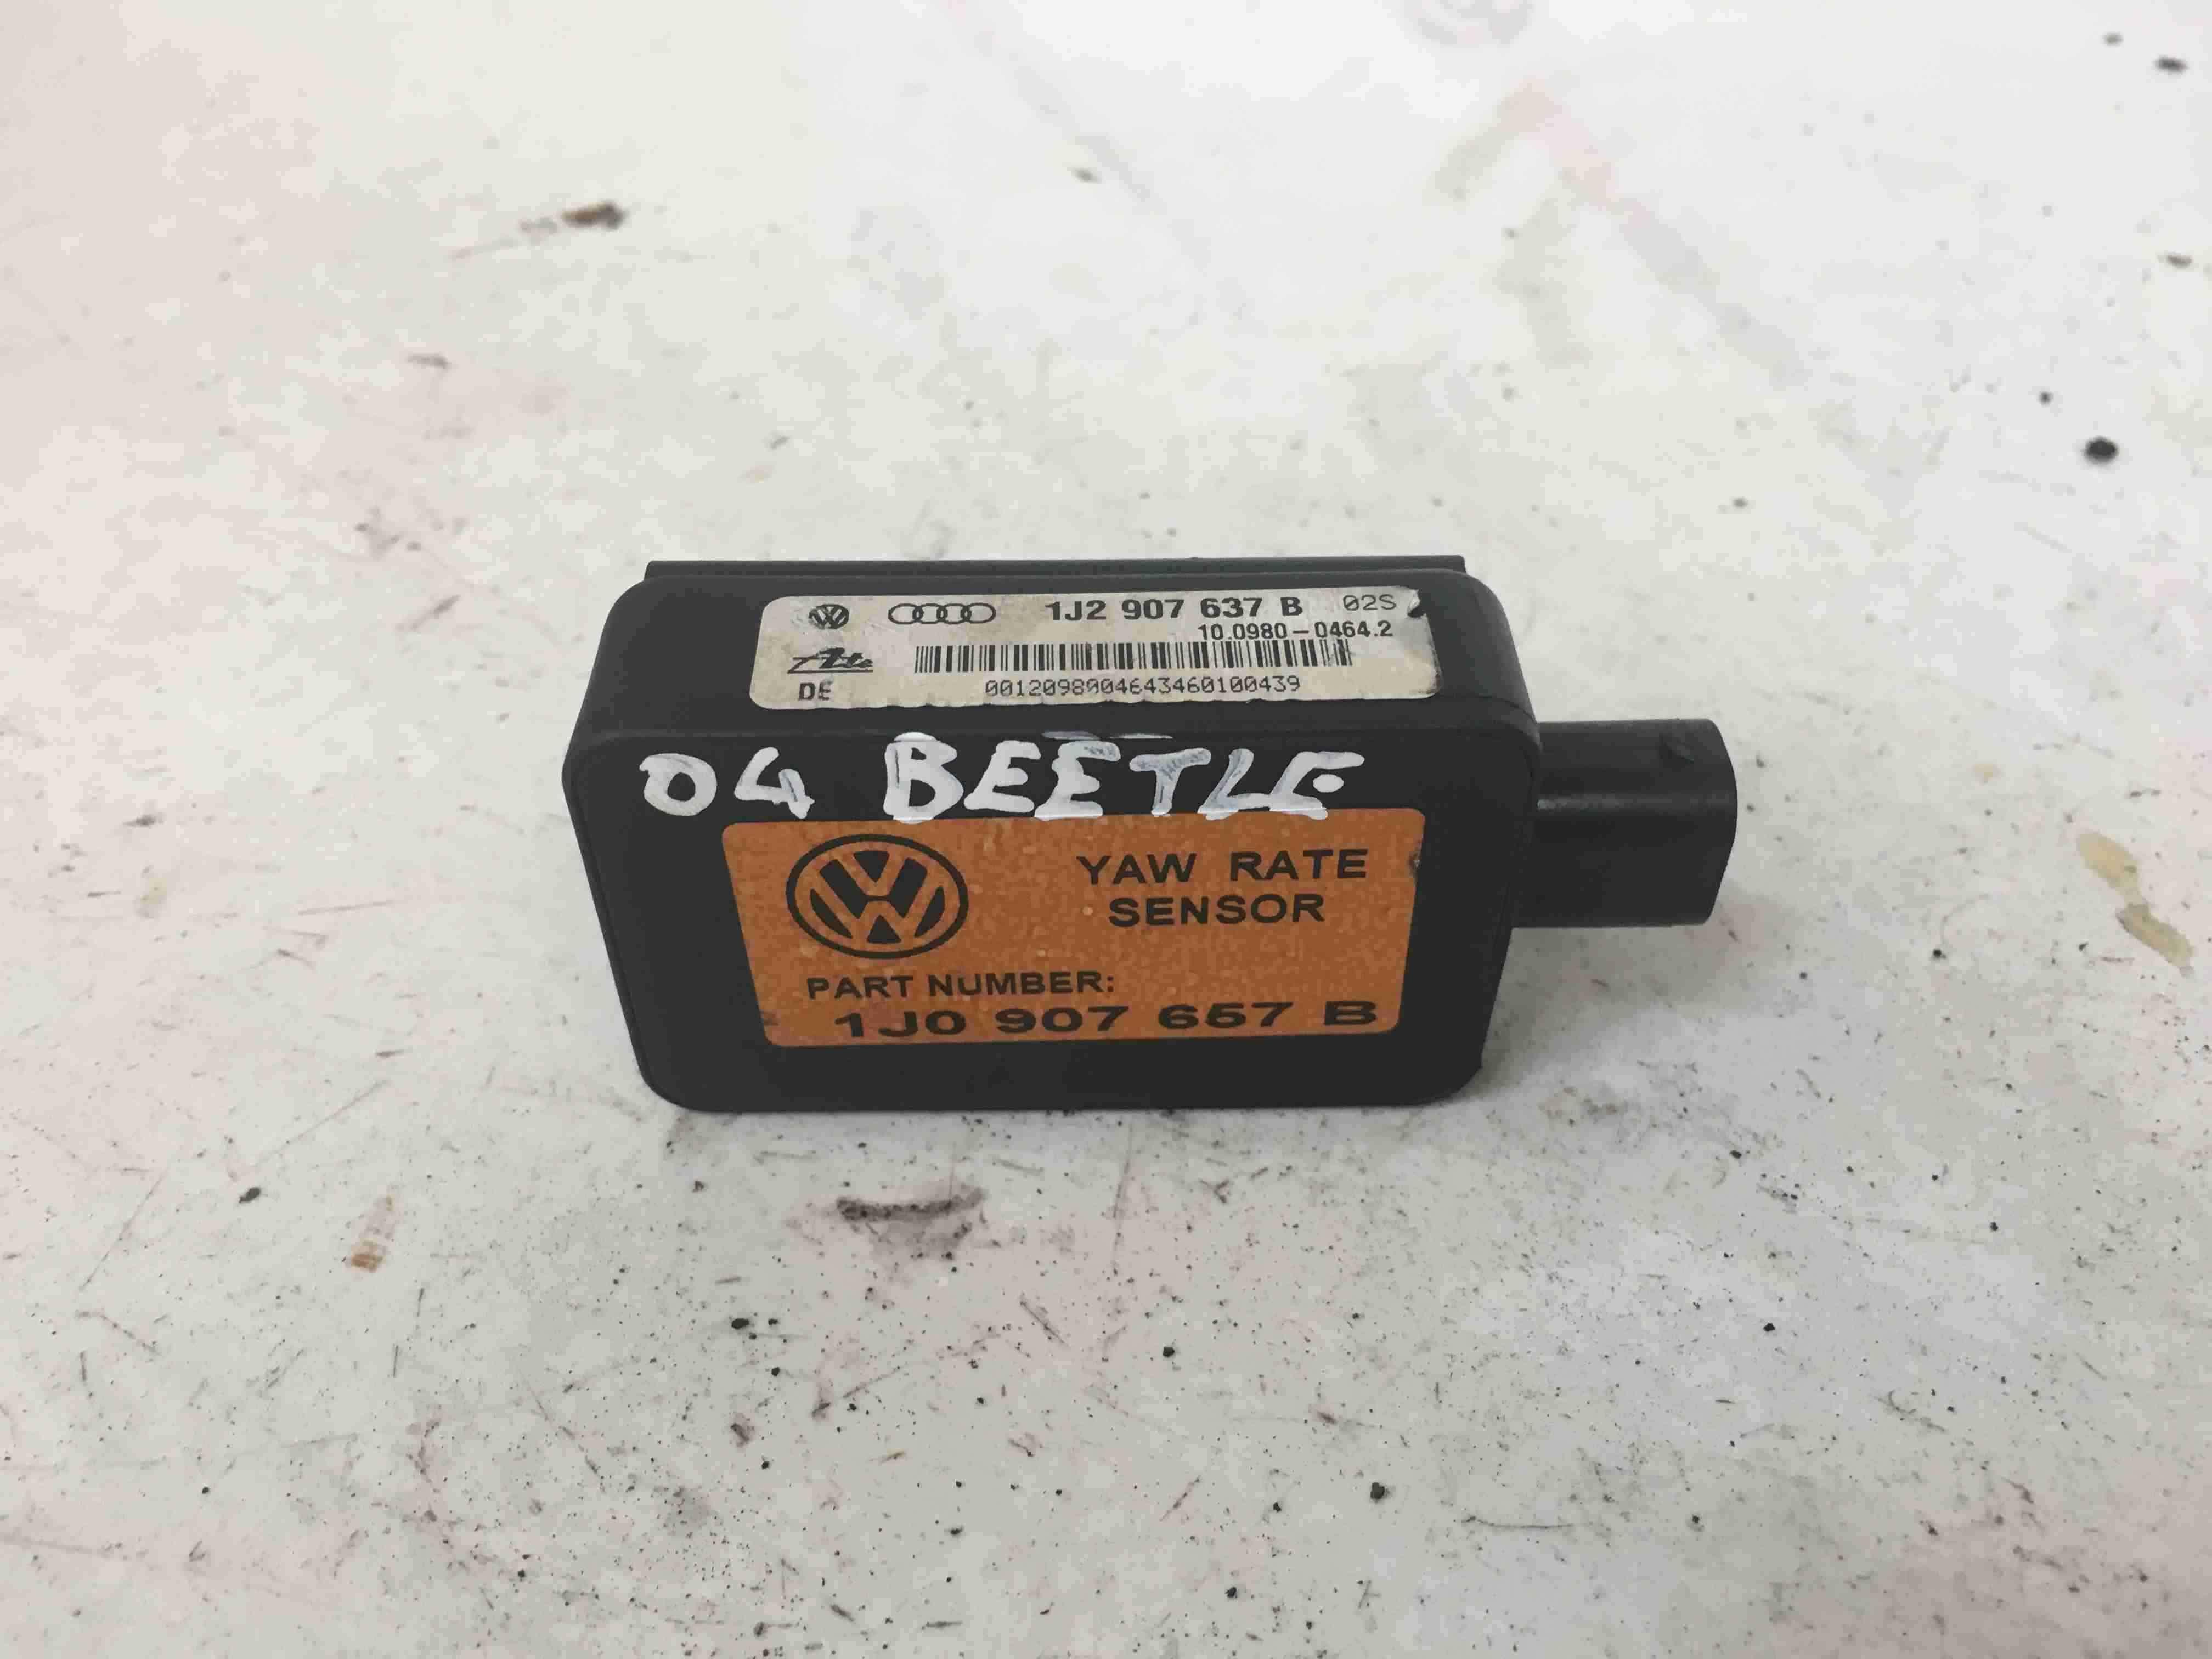 Volkswagen Beetle 1998-2006 ESP YAW Rate Sensor 1J2907637B